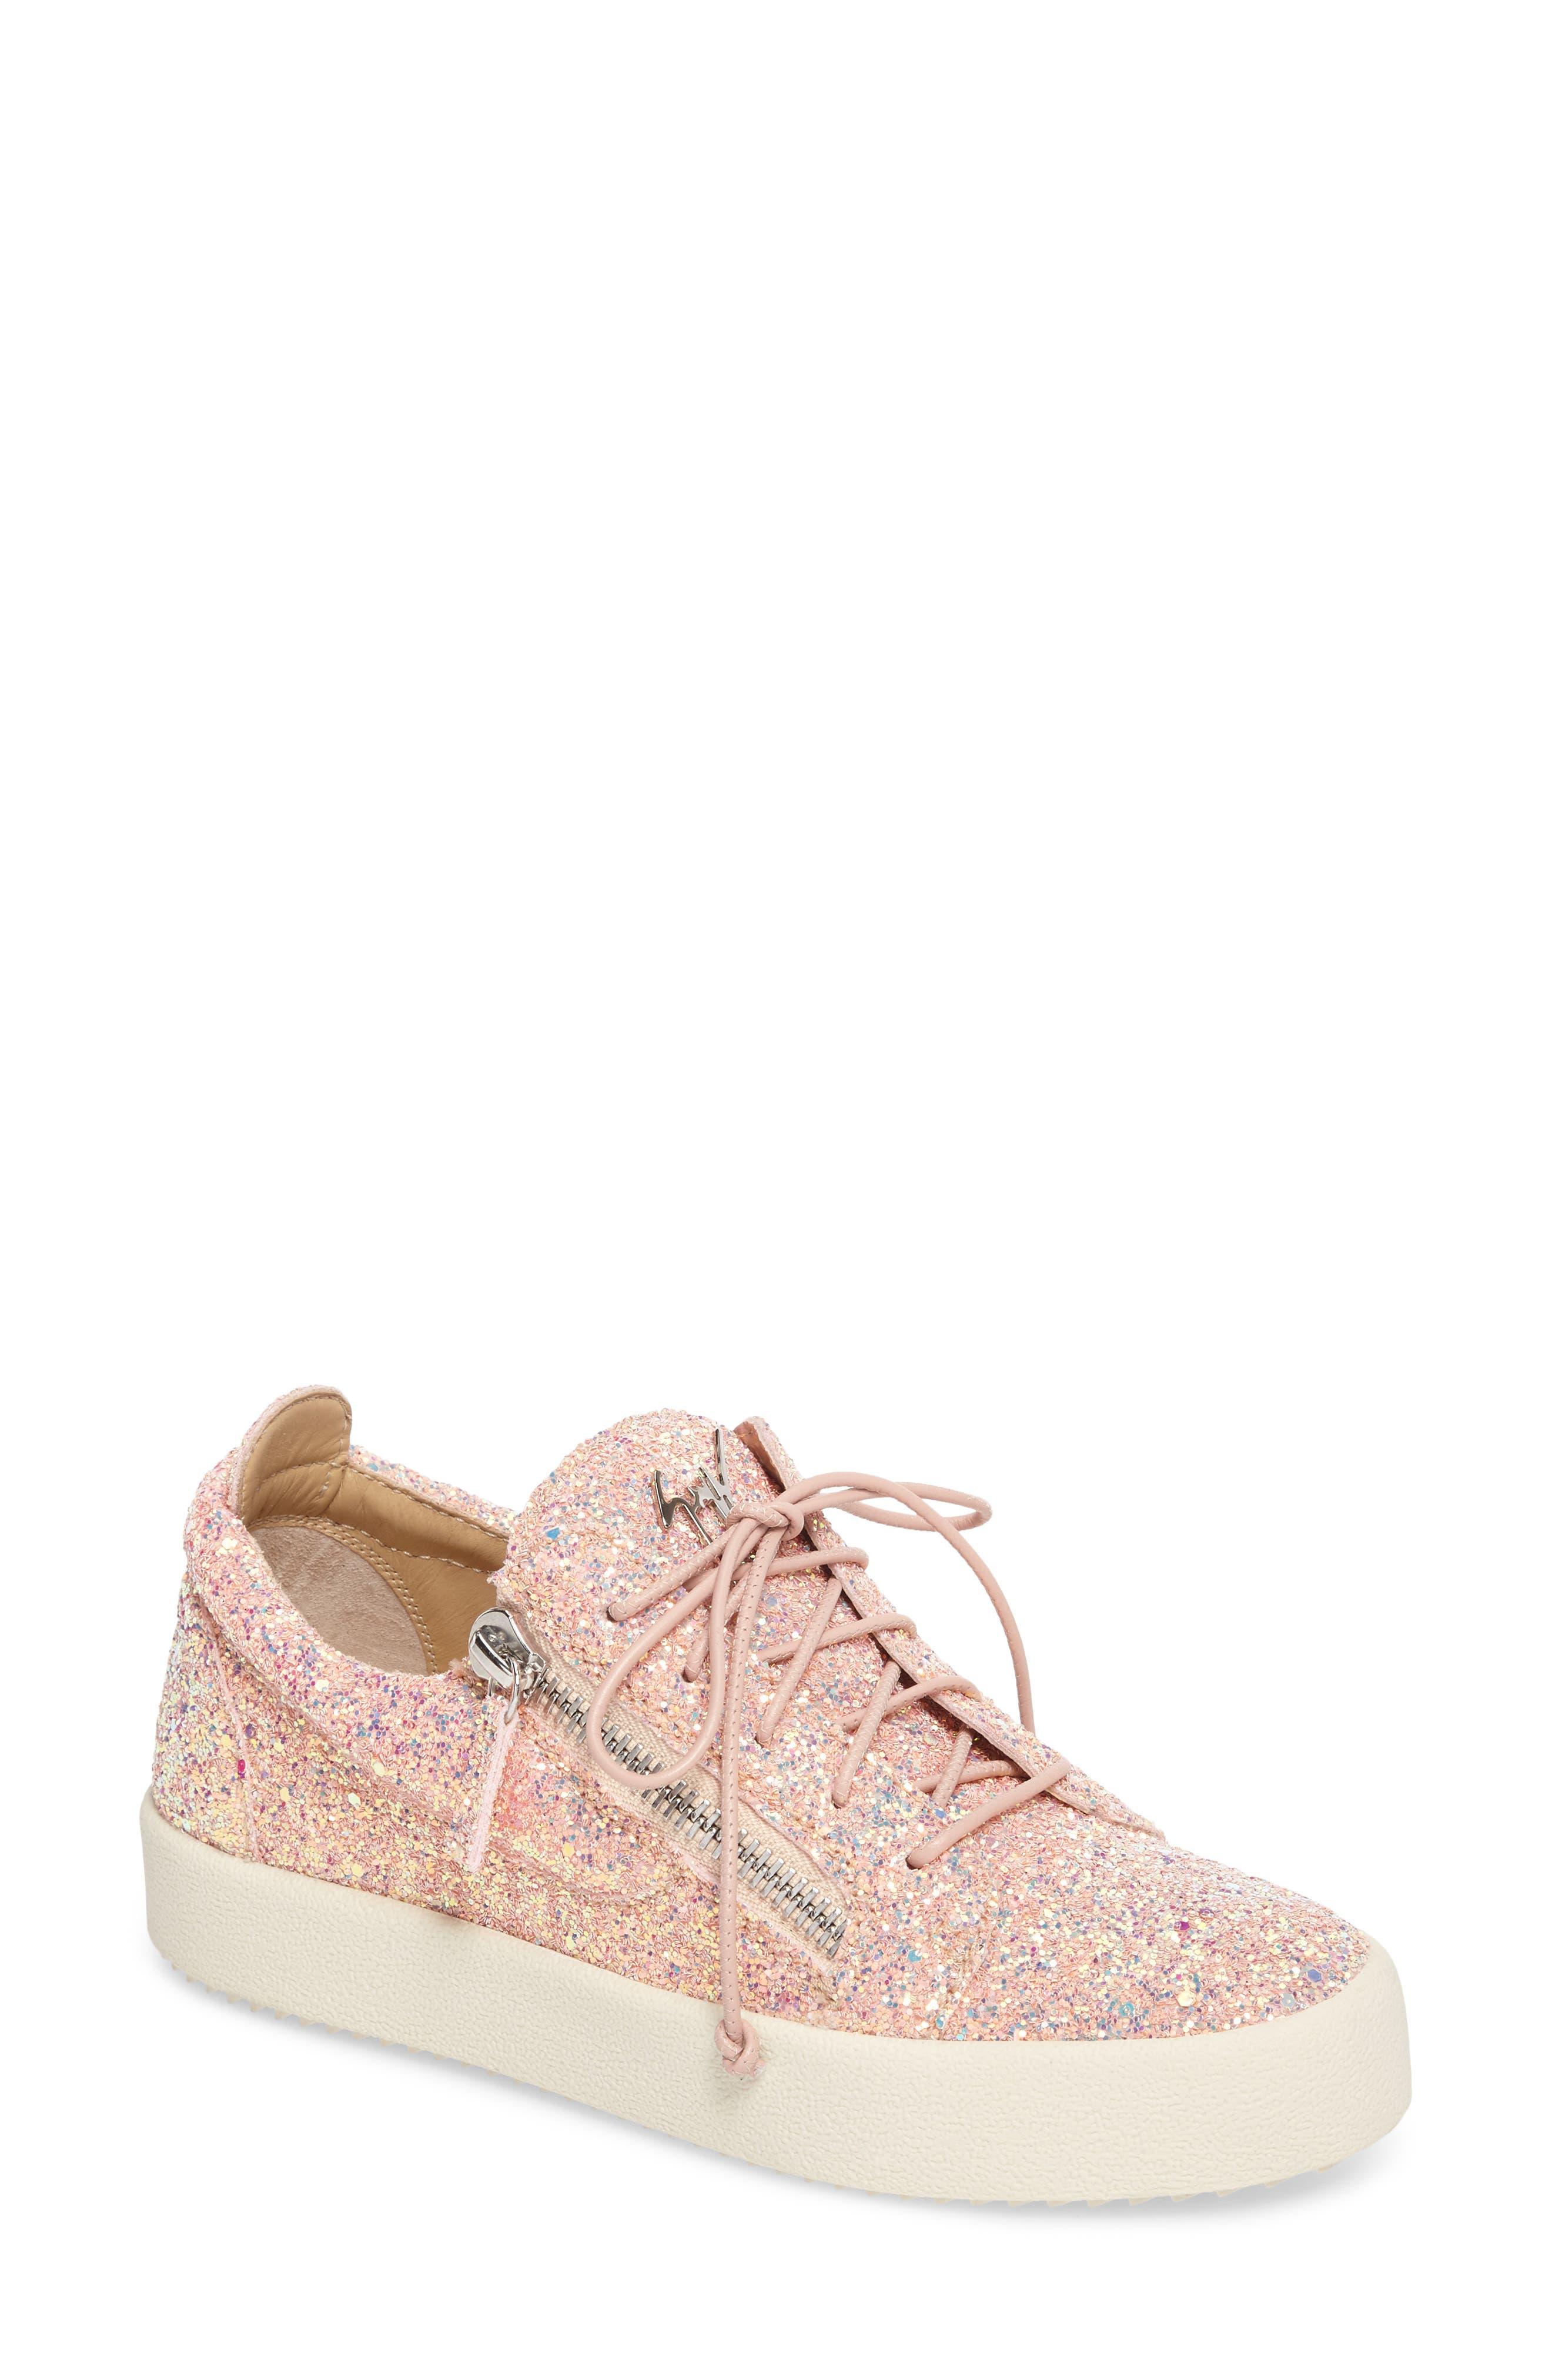 Main Image - Giuseppe Zanotti May London Low Top Sneaker (Women)